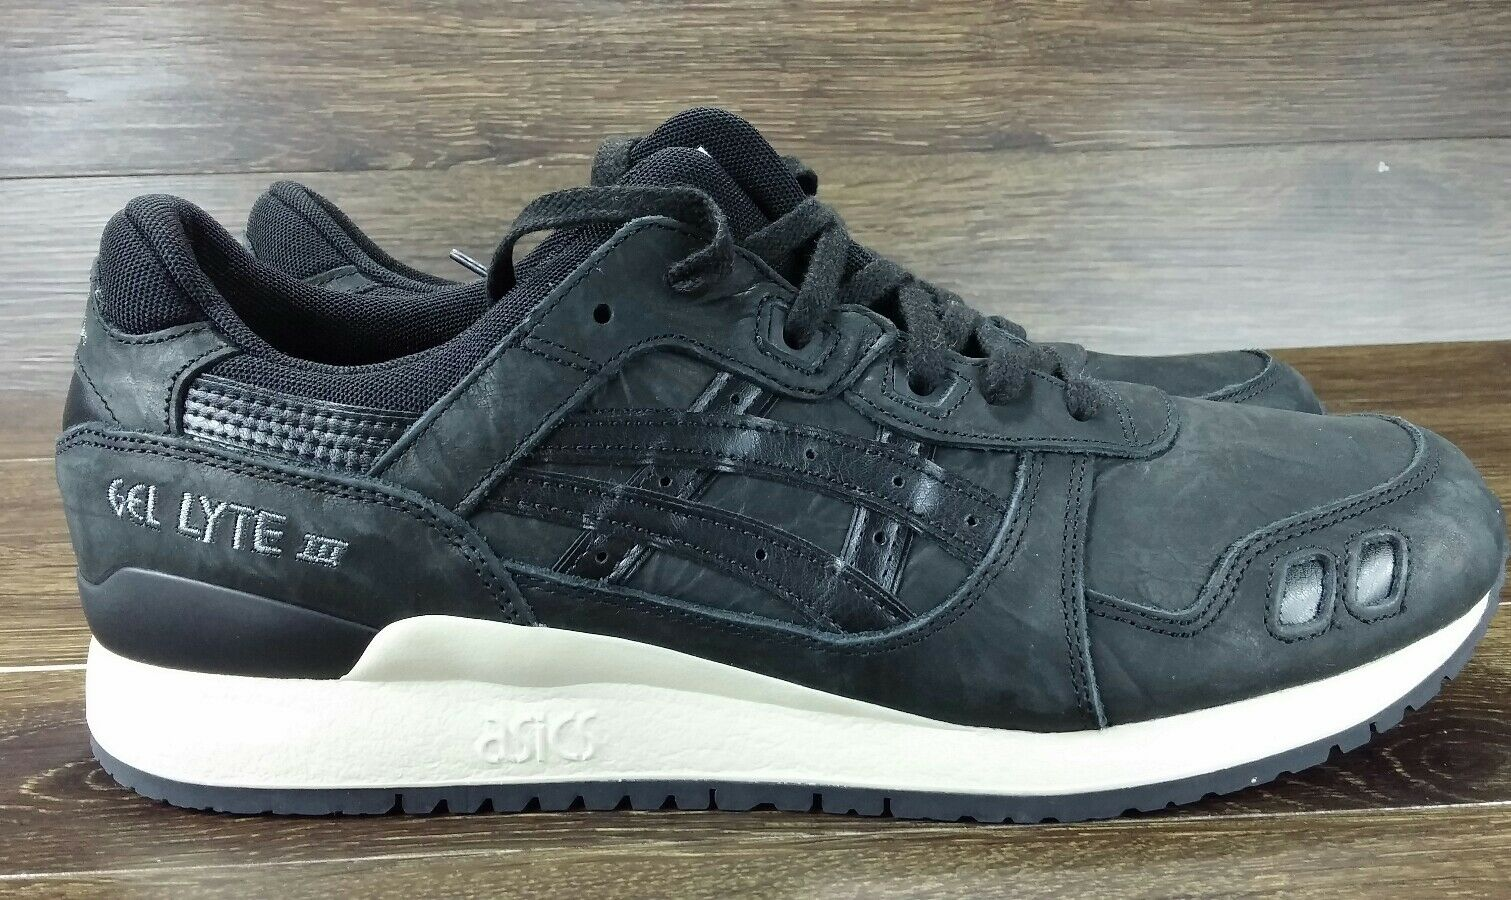 Asics Tiger Men's Sneakers Gel-Lyte III Black Black HL7V3-9090 Men 12